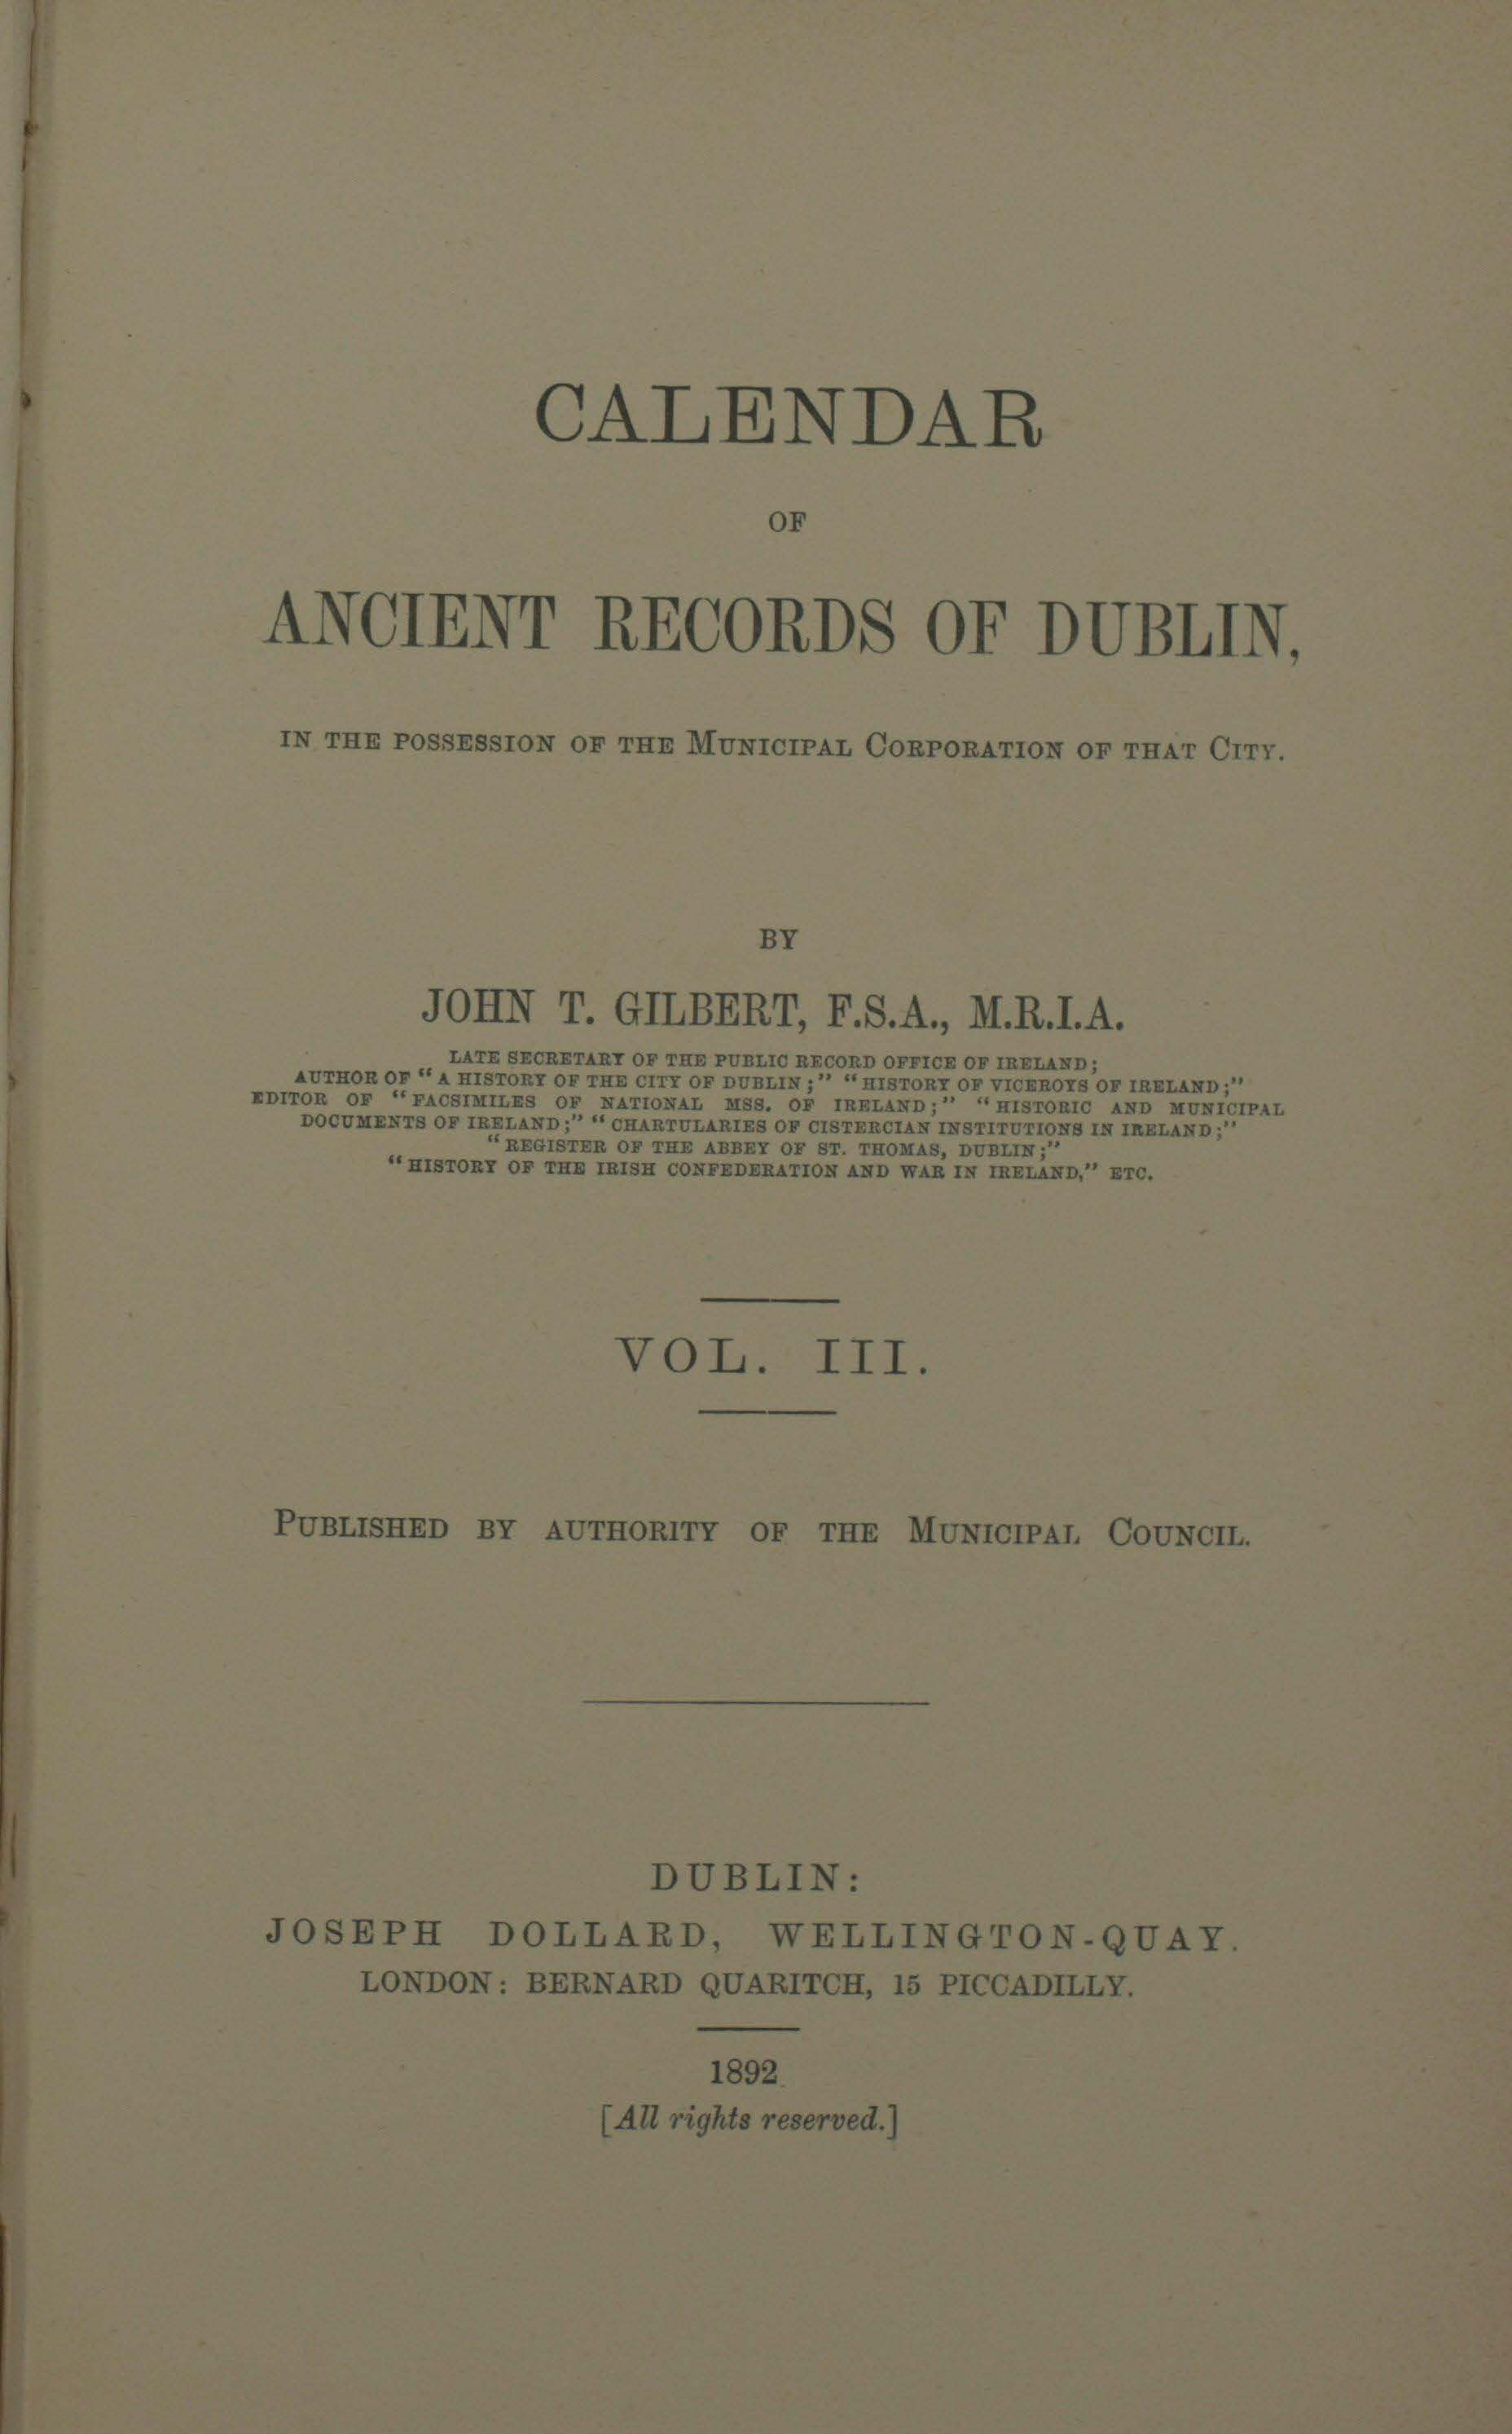 photo of  Calendar of Ancient Records of Dublin Vol III, 1892